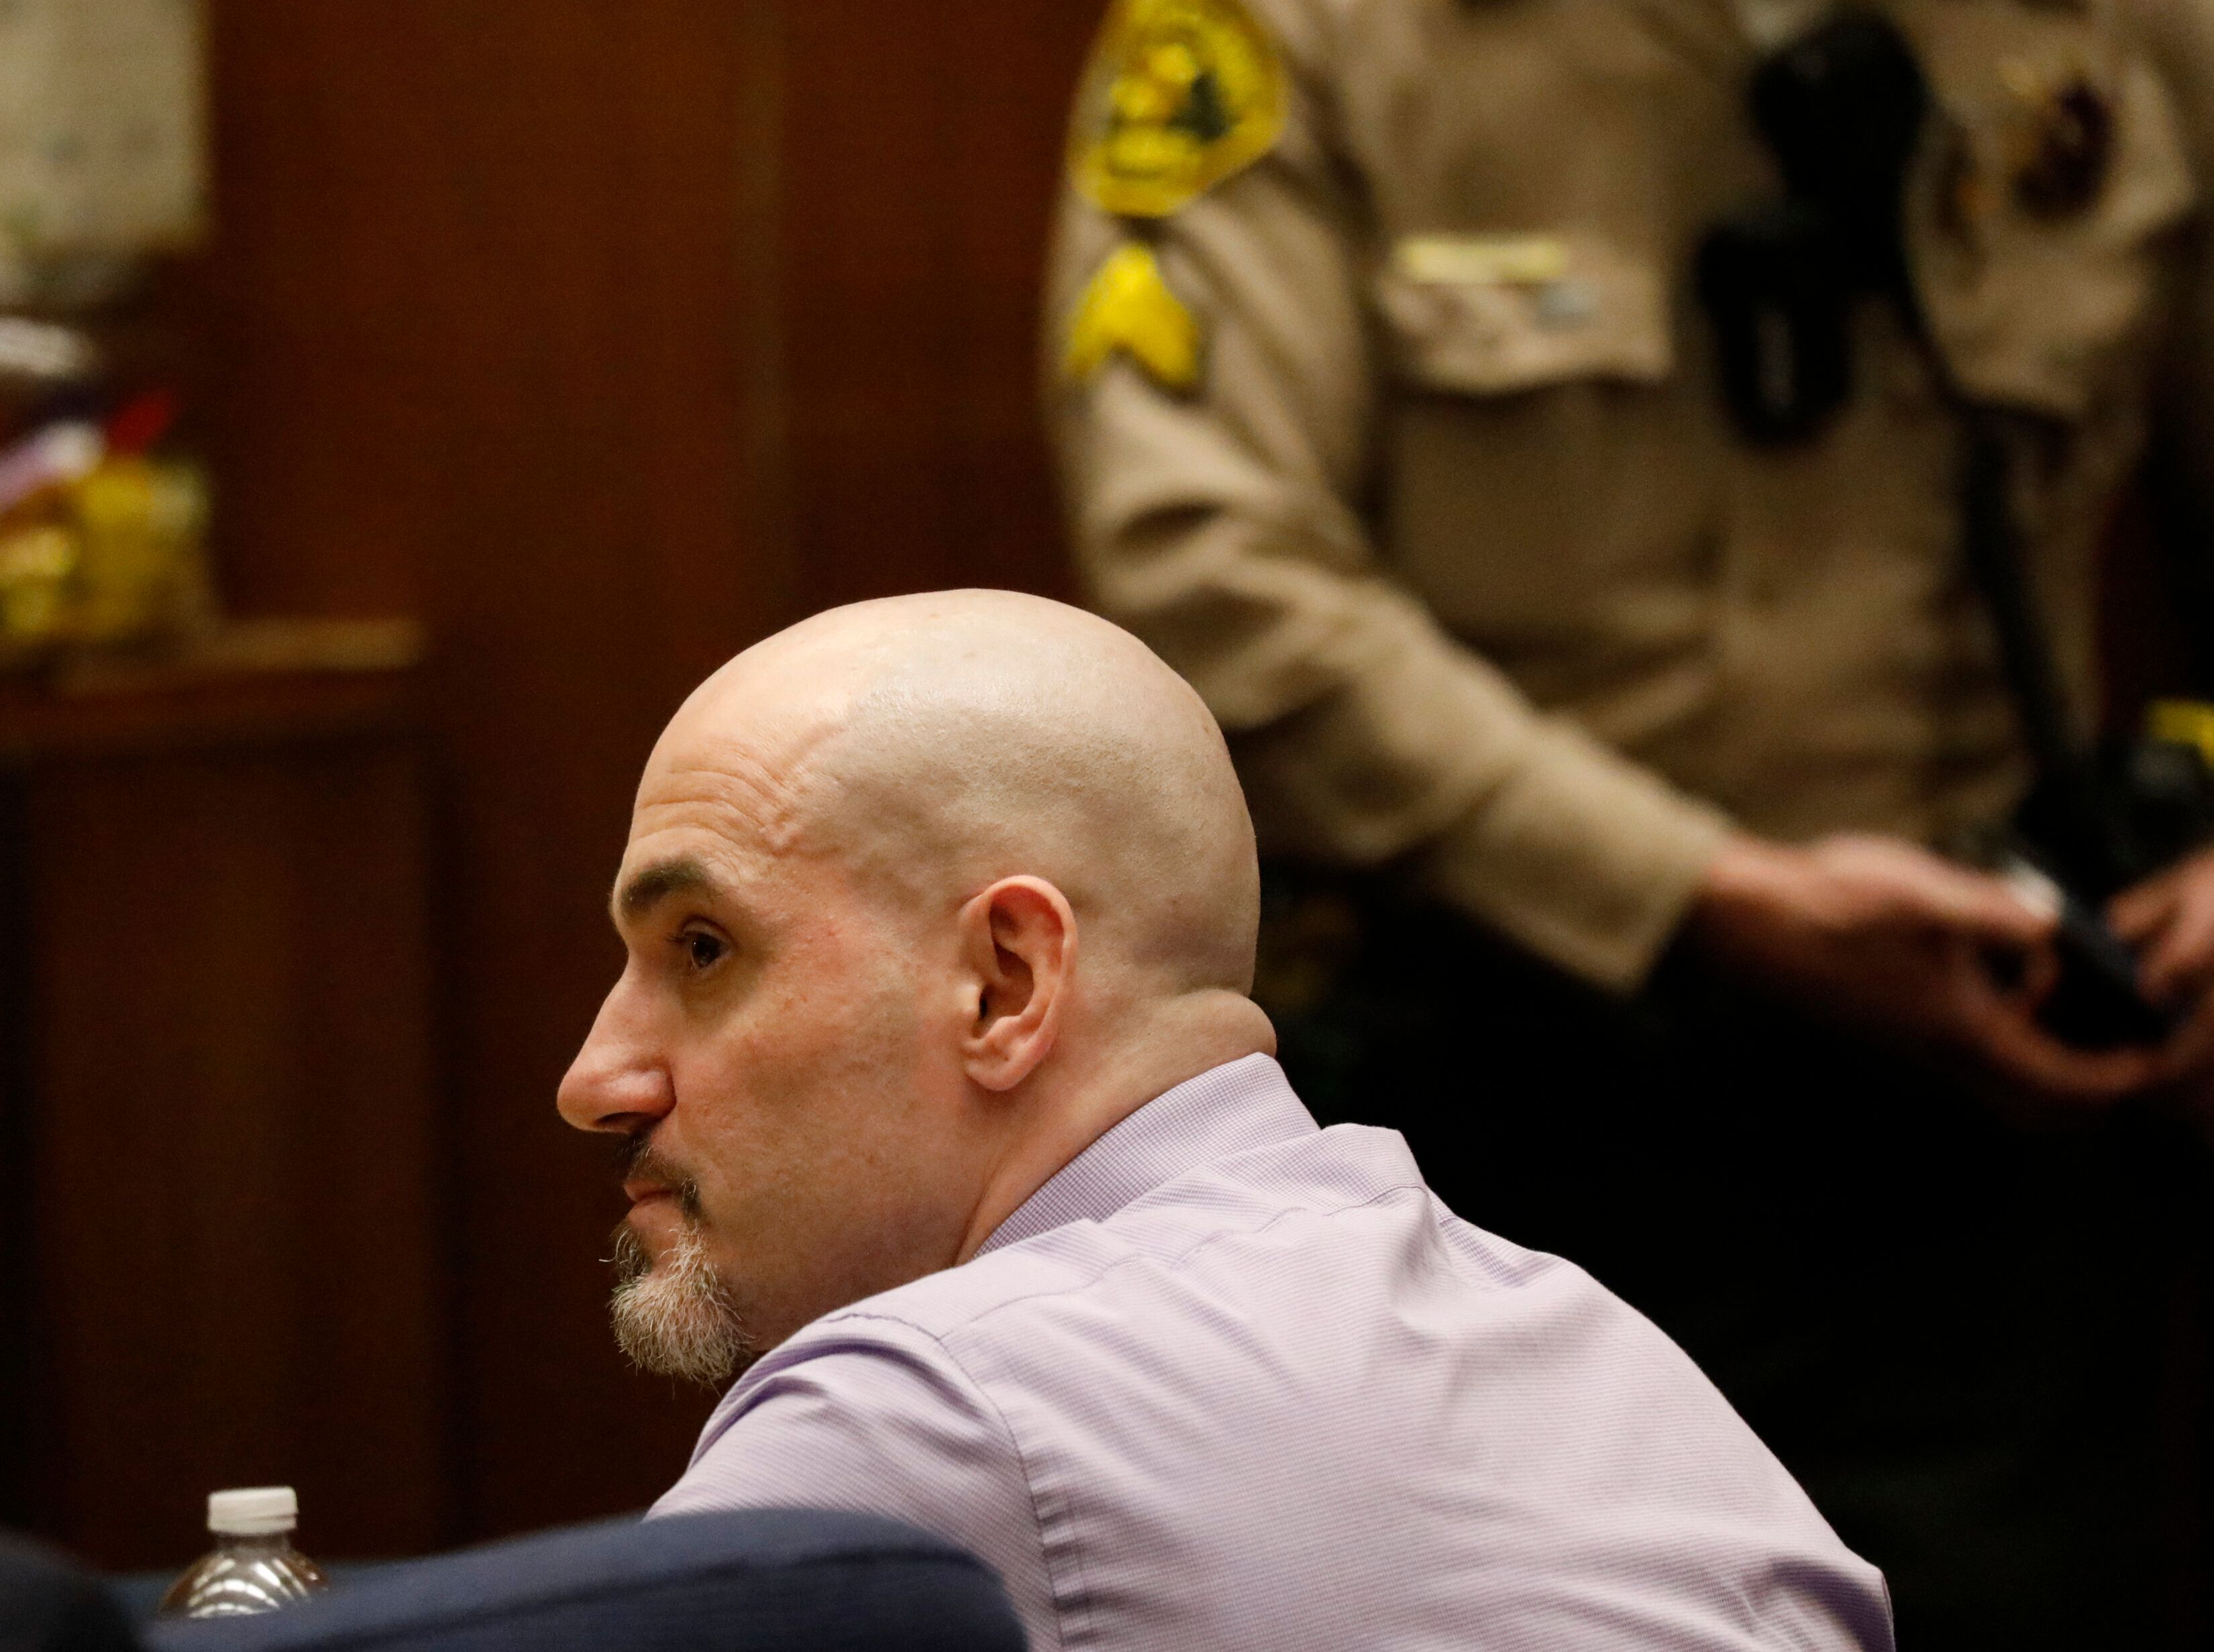 Michael Gargiulo, listens to his defense attorney Daniel Nardoni's opening statement in Los Angeles Superior Court at his tri